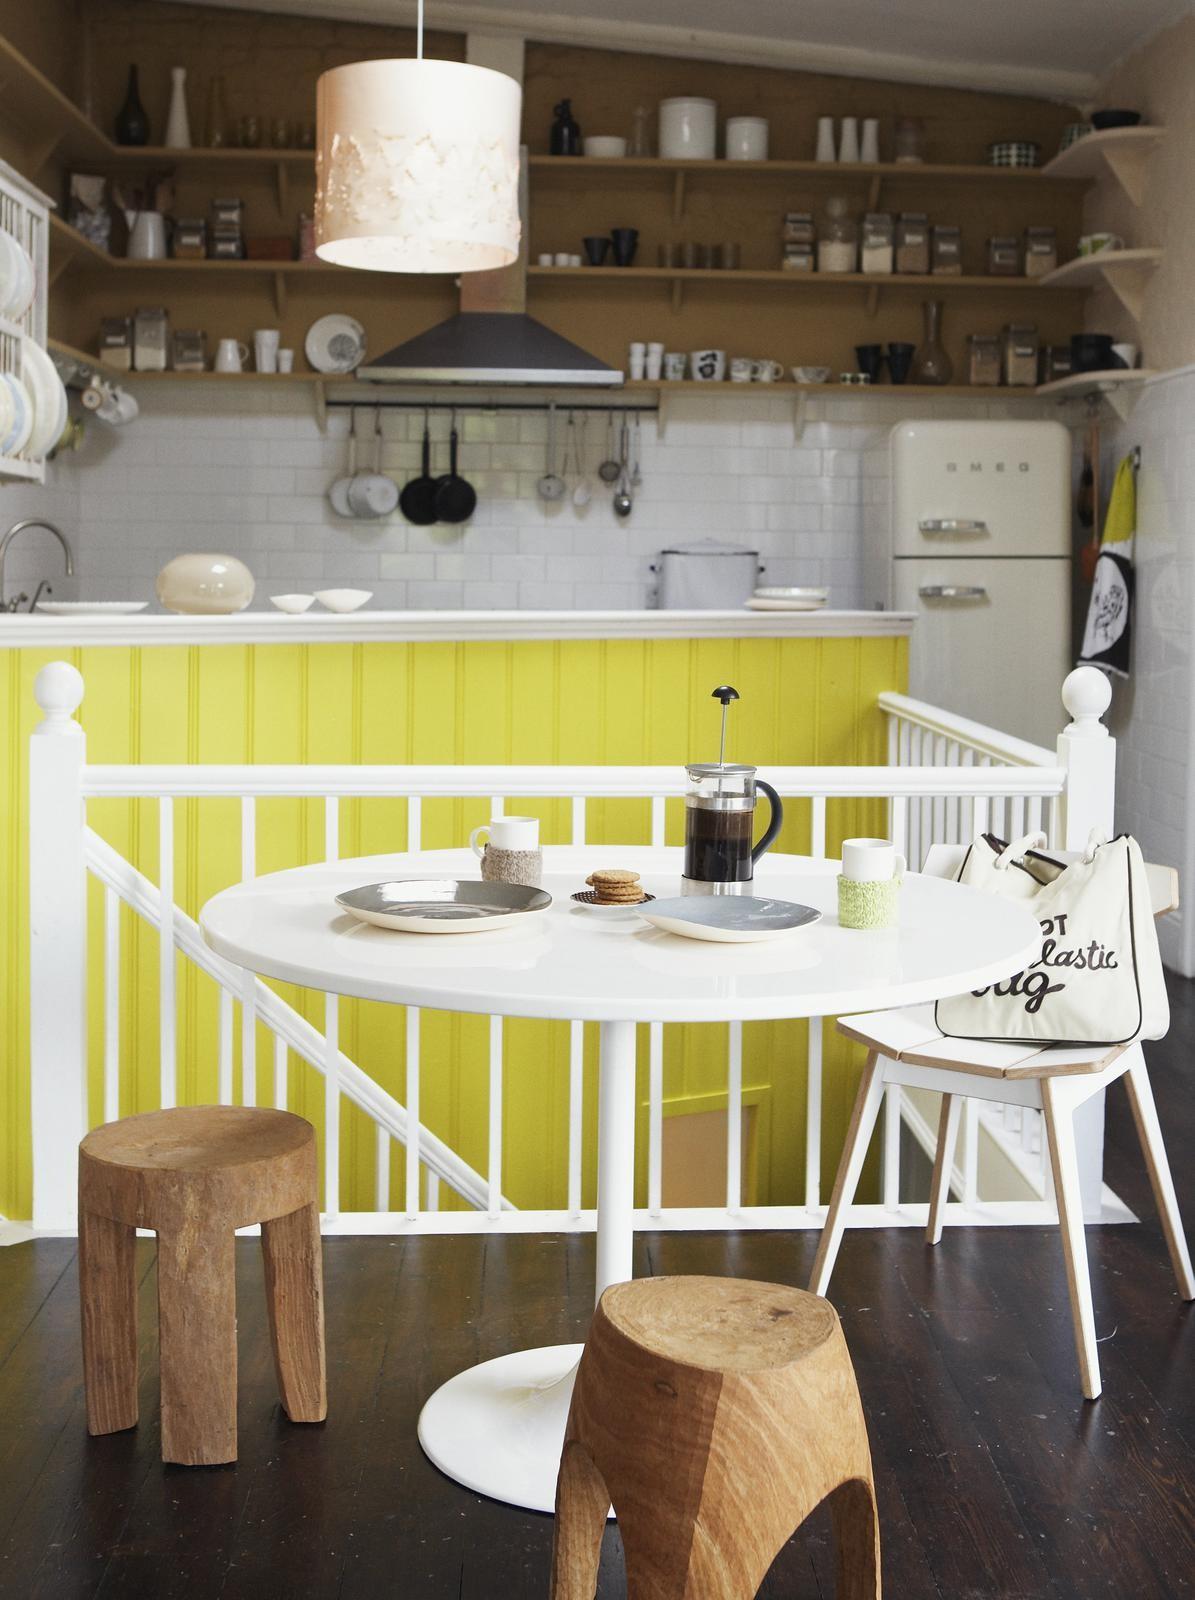 Kjøkken - Nordsjö Idé & Design